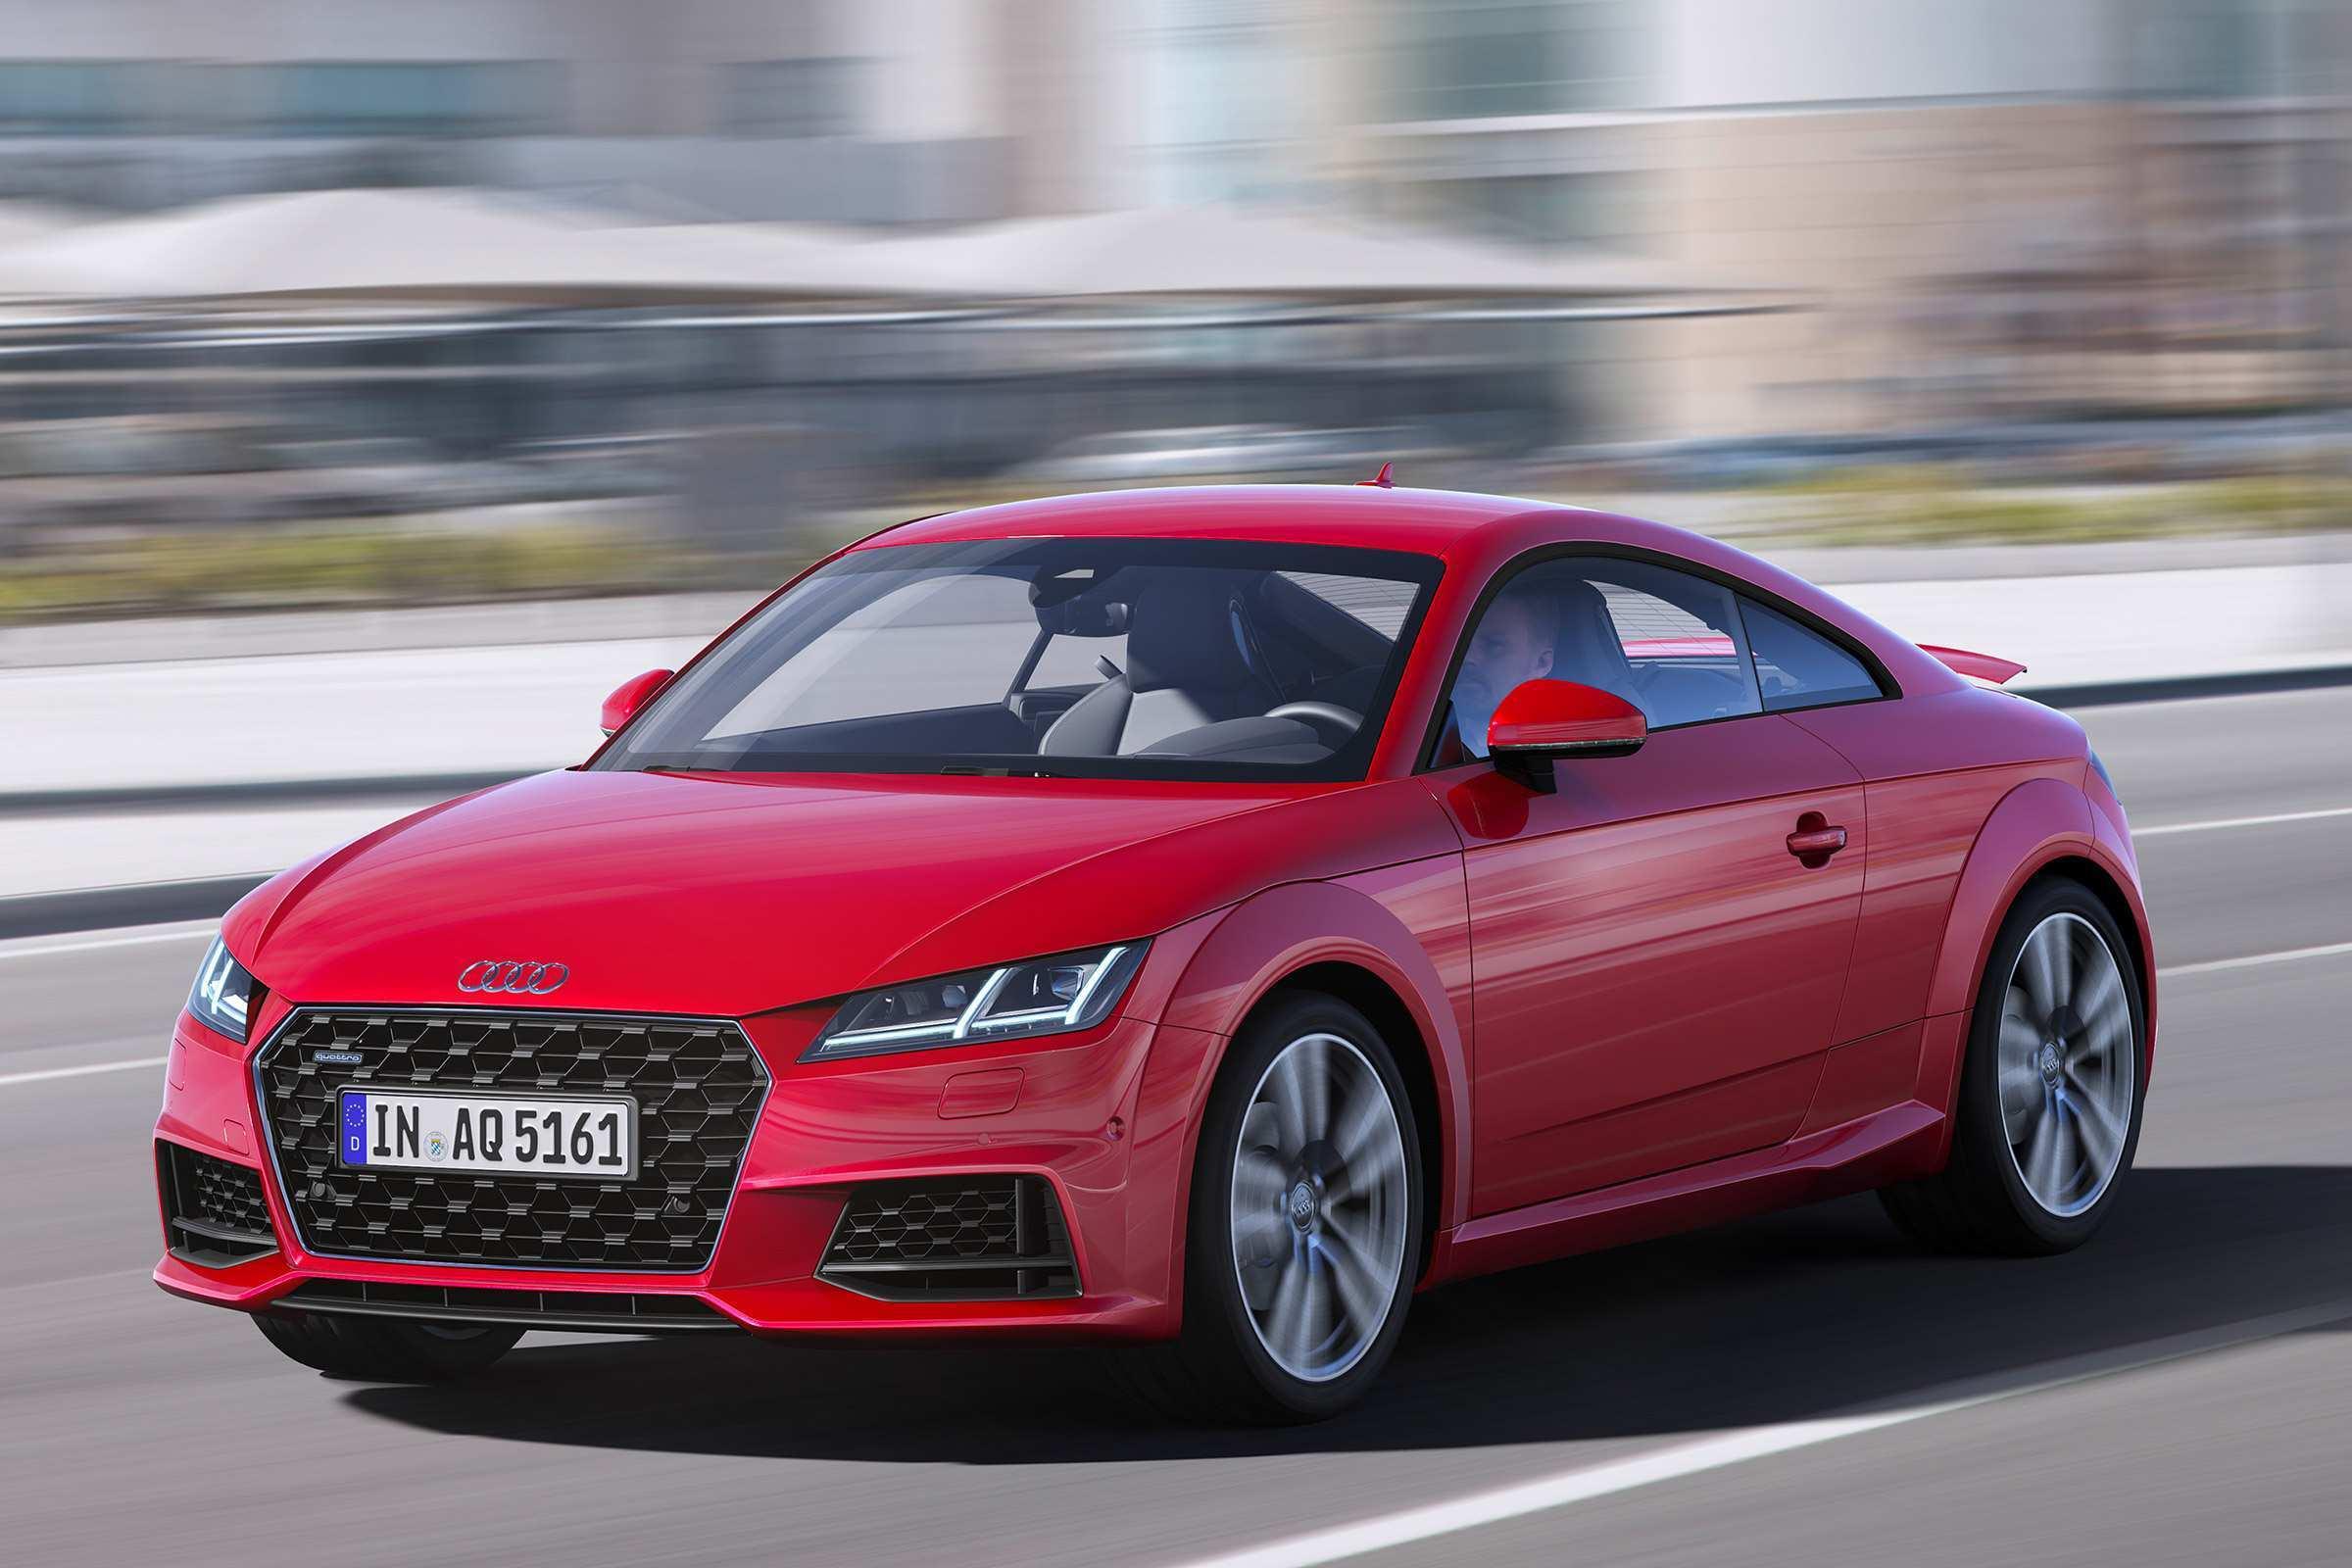 70 Concept of 2019 Audi Tt Pictures by 2019 Audi Tt